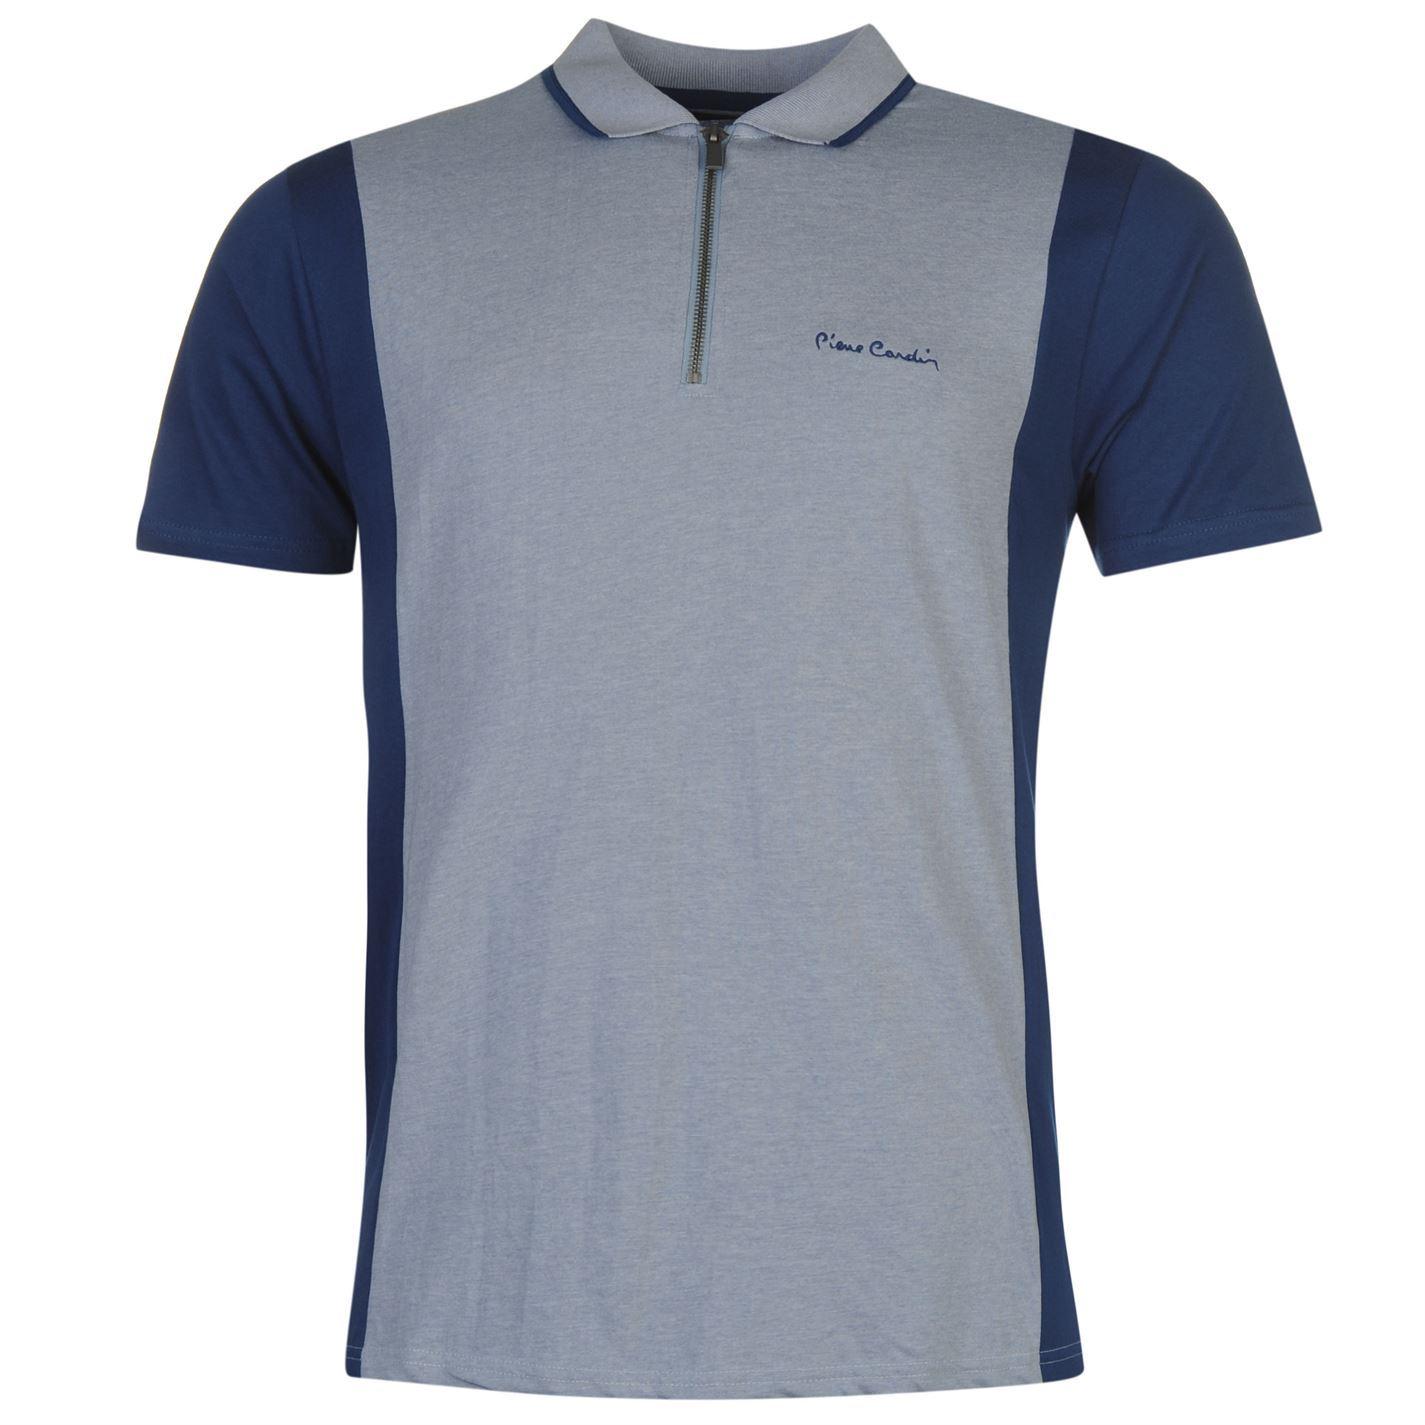 pierre cardin zip neck polo shirt mens denim blue top t. Black Bedroom Furniture Sets. Home Design Ideas